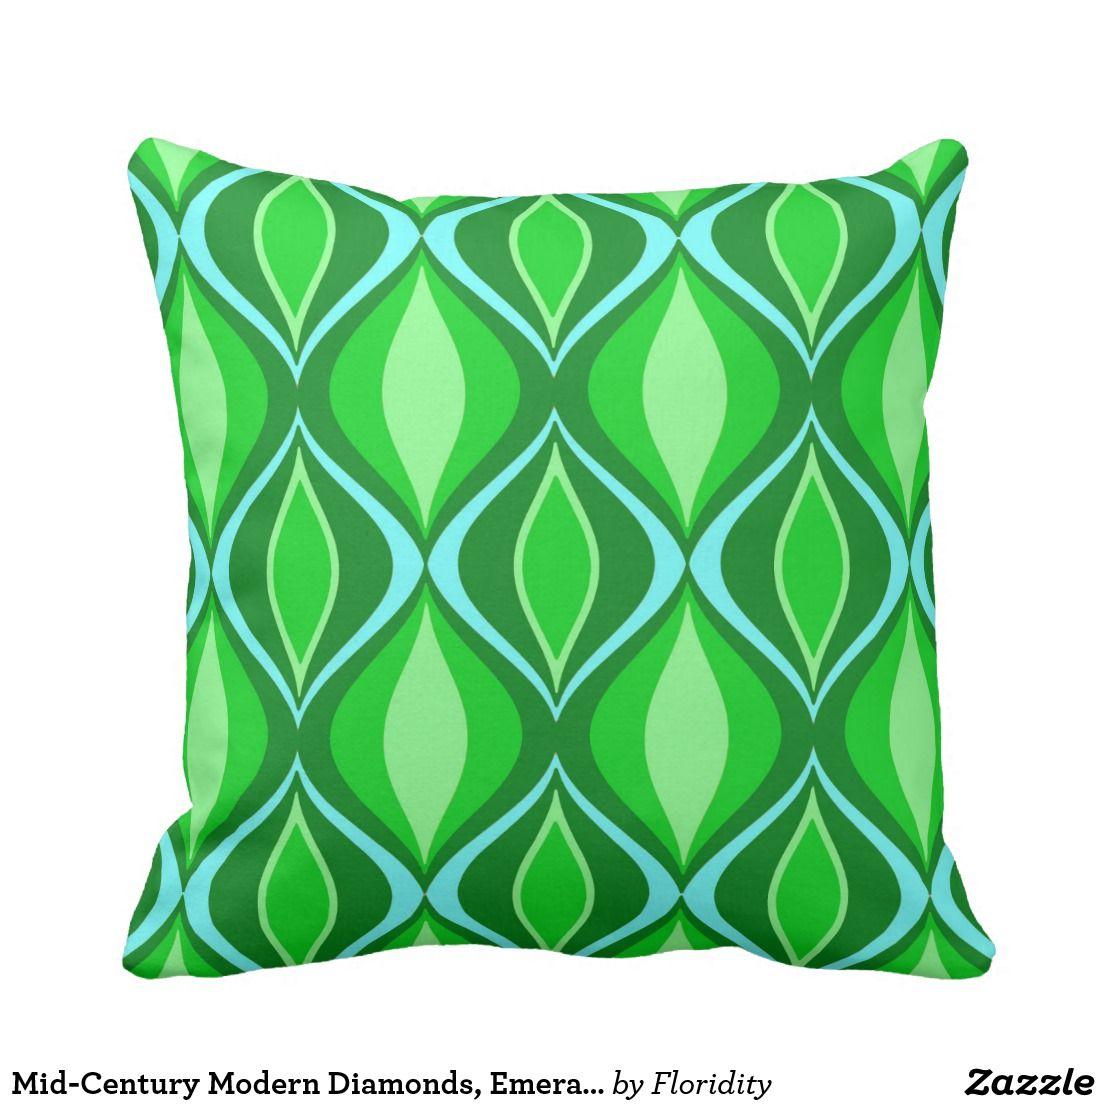 Midcentury modern diamonds emerald green throw cushion cushions